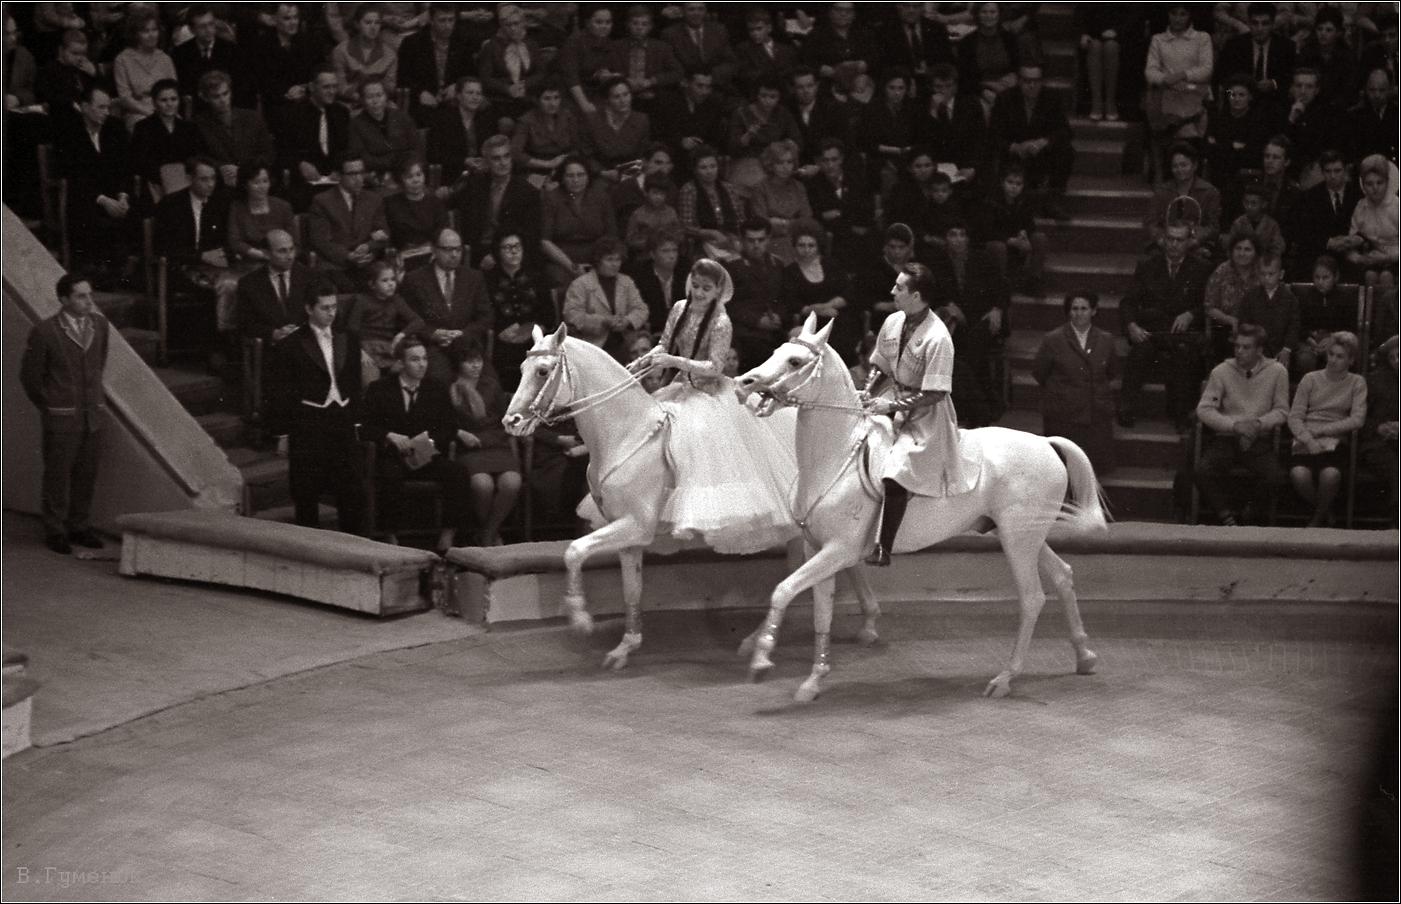 142. 1964. Цирк. Наездники